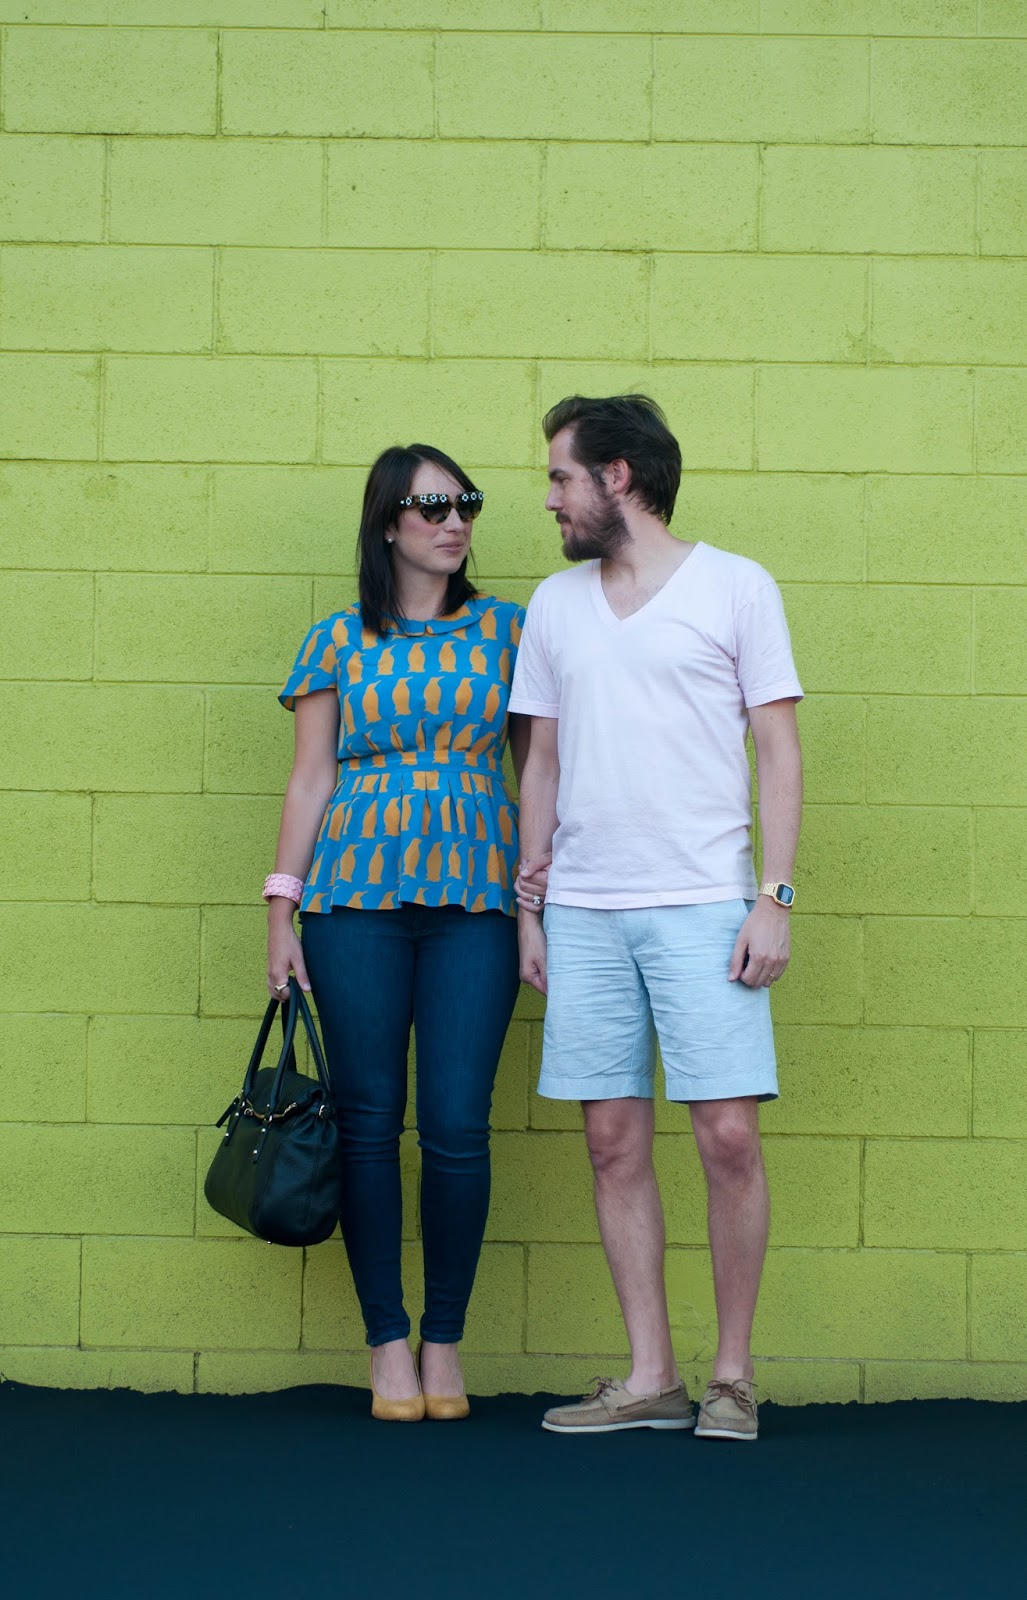 couples style, couples fashion, couples blog, ootd, mens fashion, wiw, anthropologie ootd, jcrew